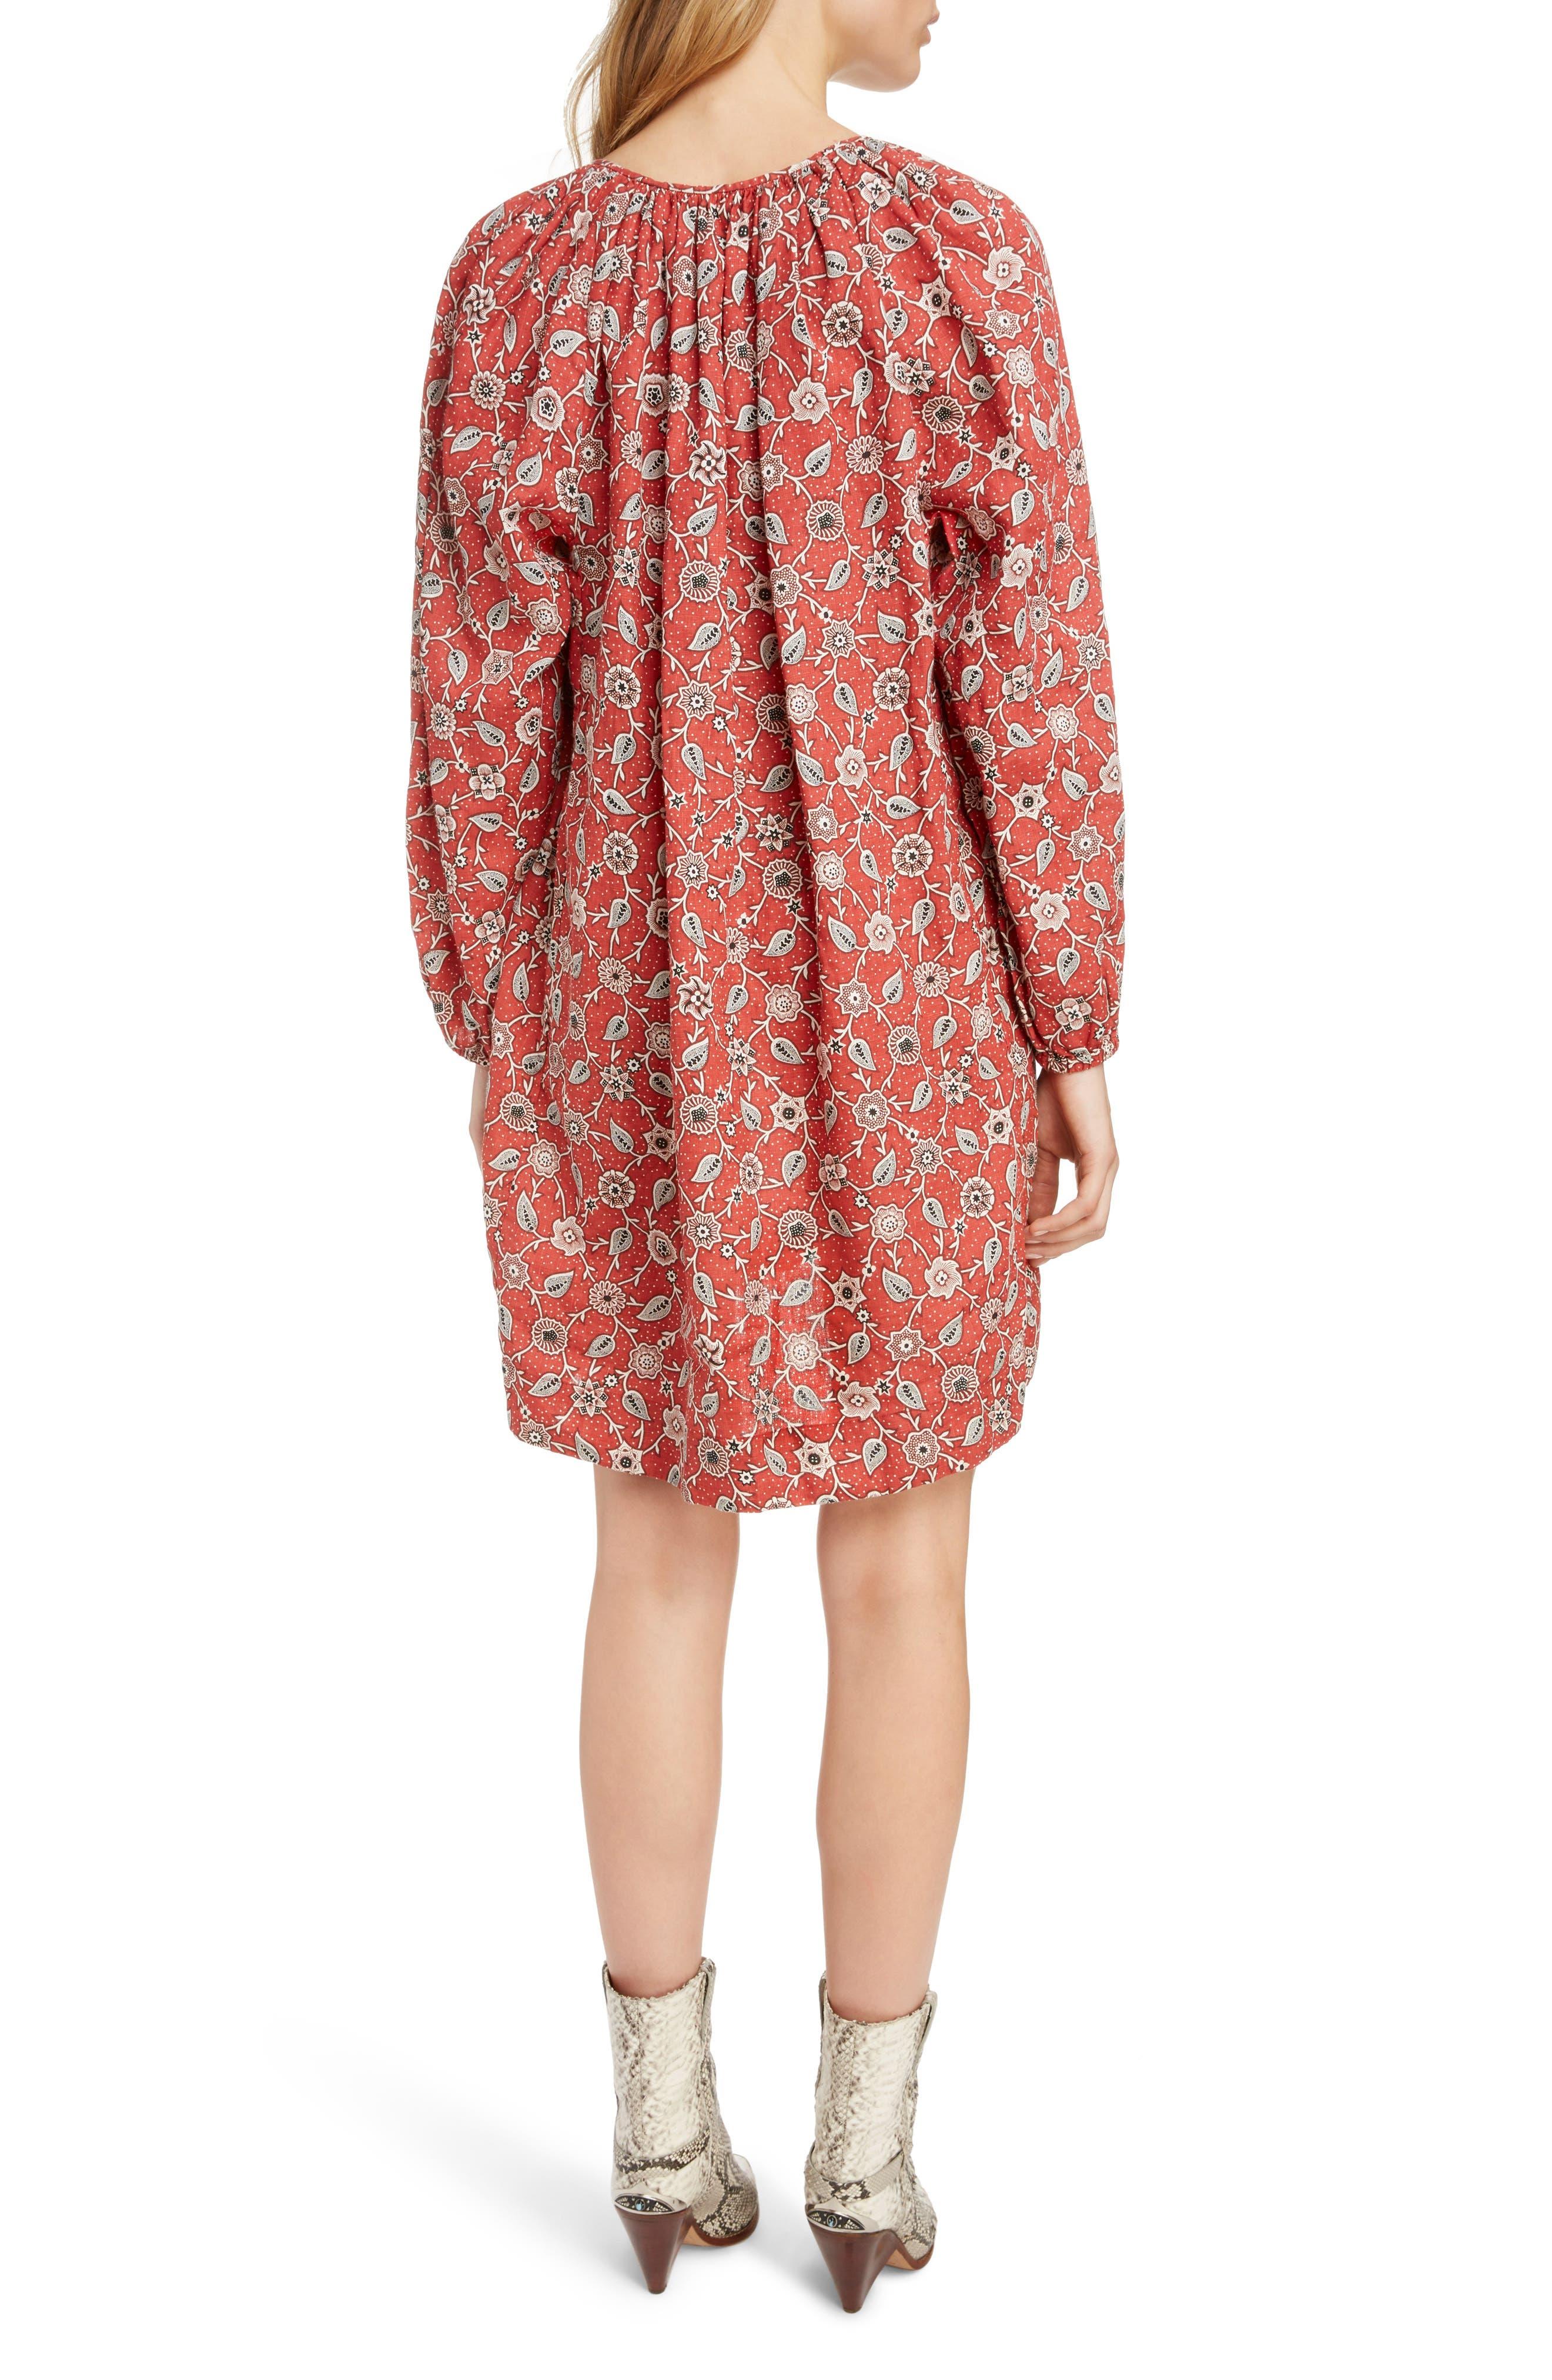 Tockya Print Linen Swing Dress,                             Alternate thumbnail 2, color,                             RUST